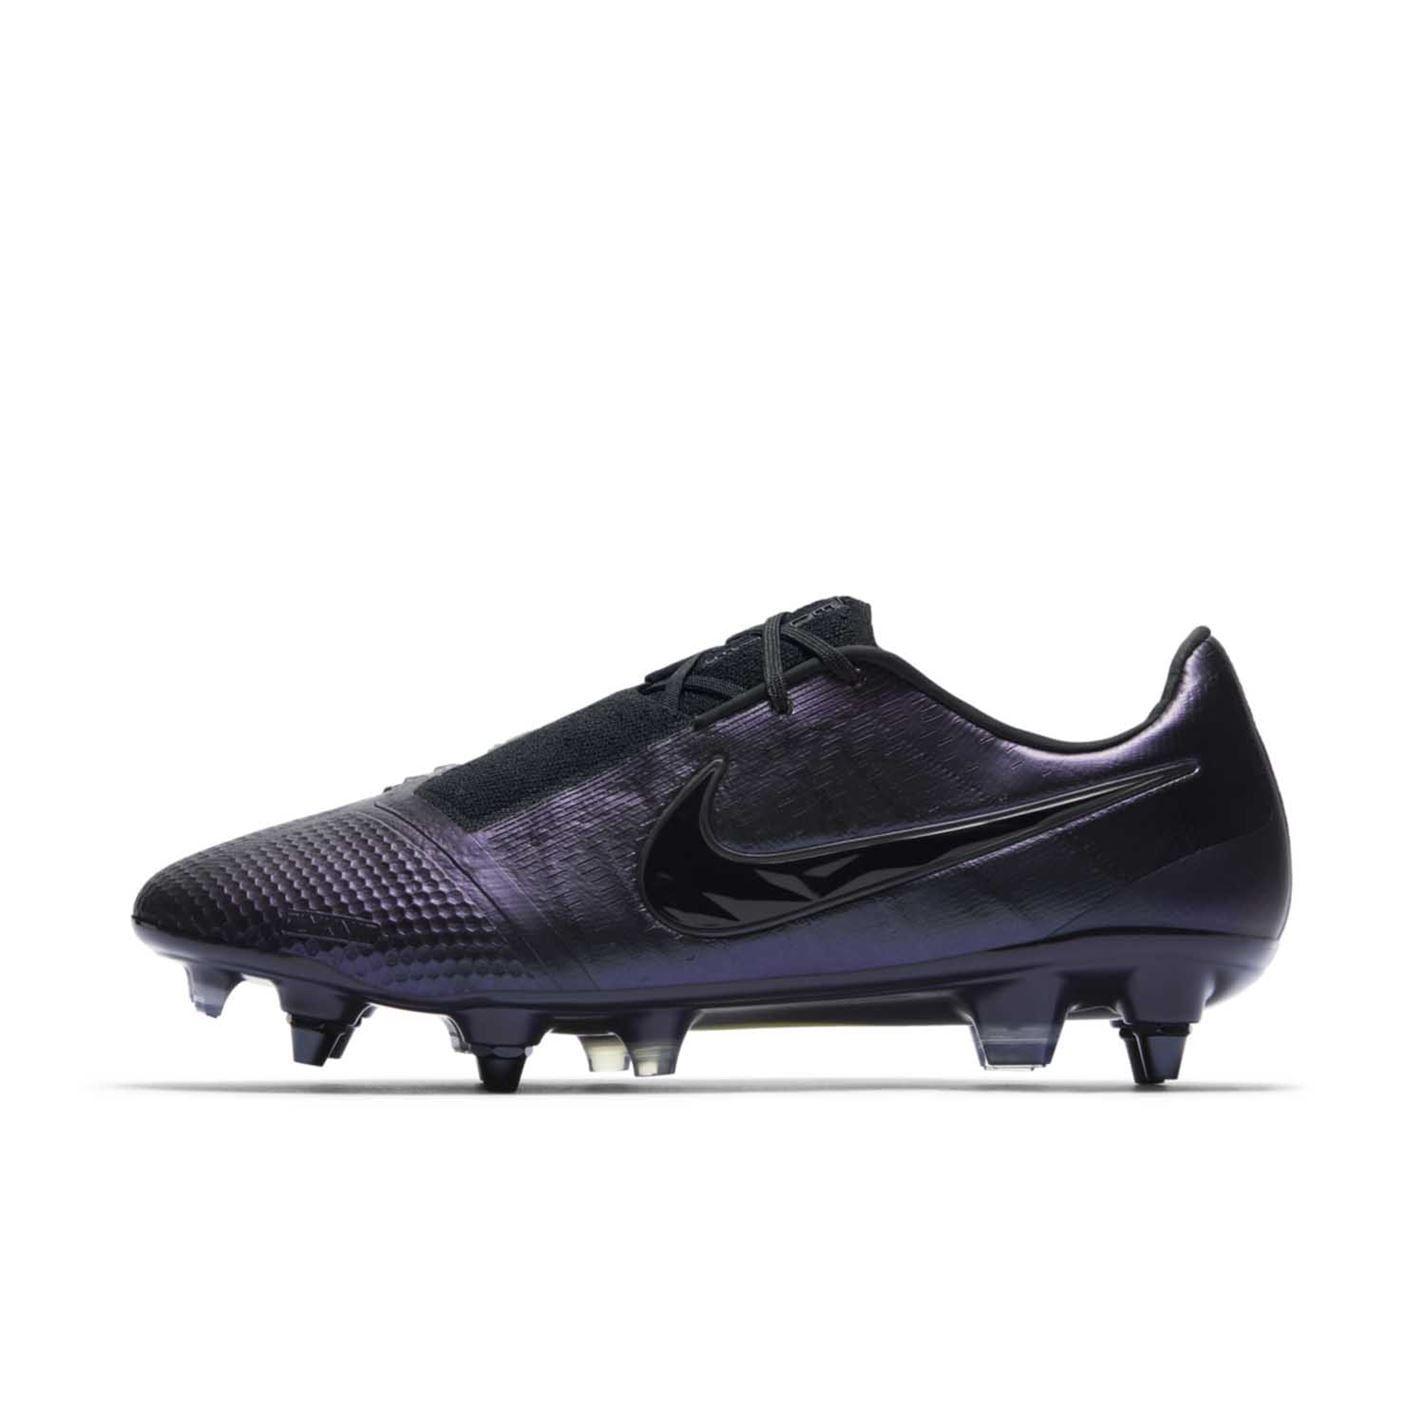 Nike-Phantom-Venom-Elite-Homme-SG-Terrain-Souple-Chaussures-De-Football-Chaussures-de-foot-crampons miniature 10